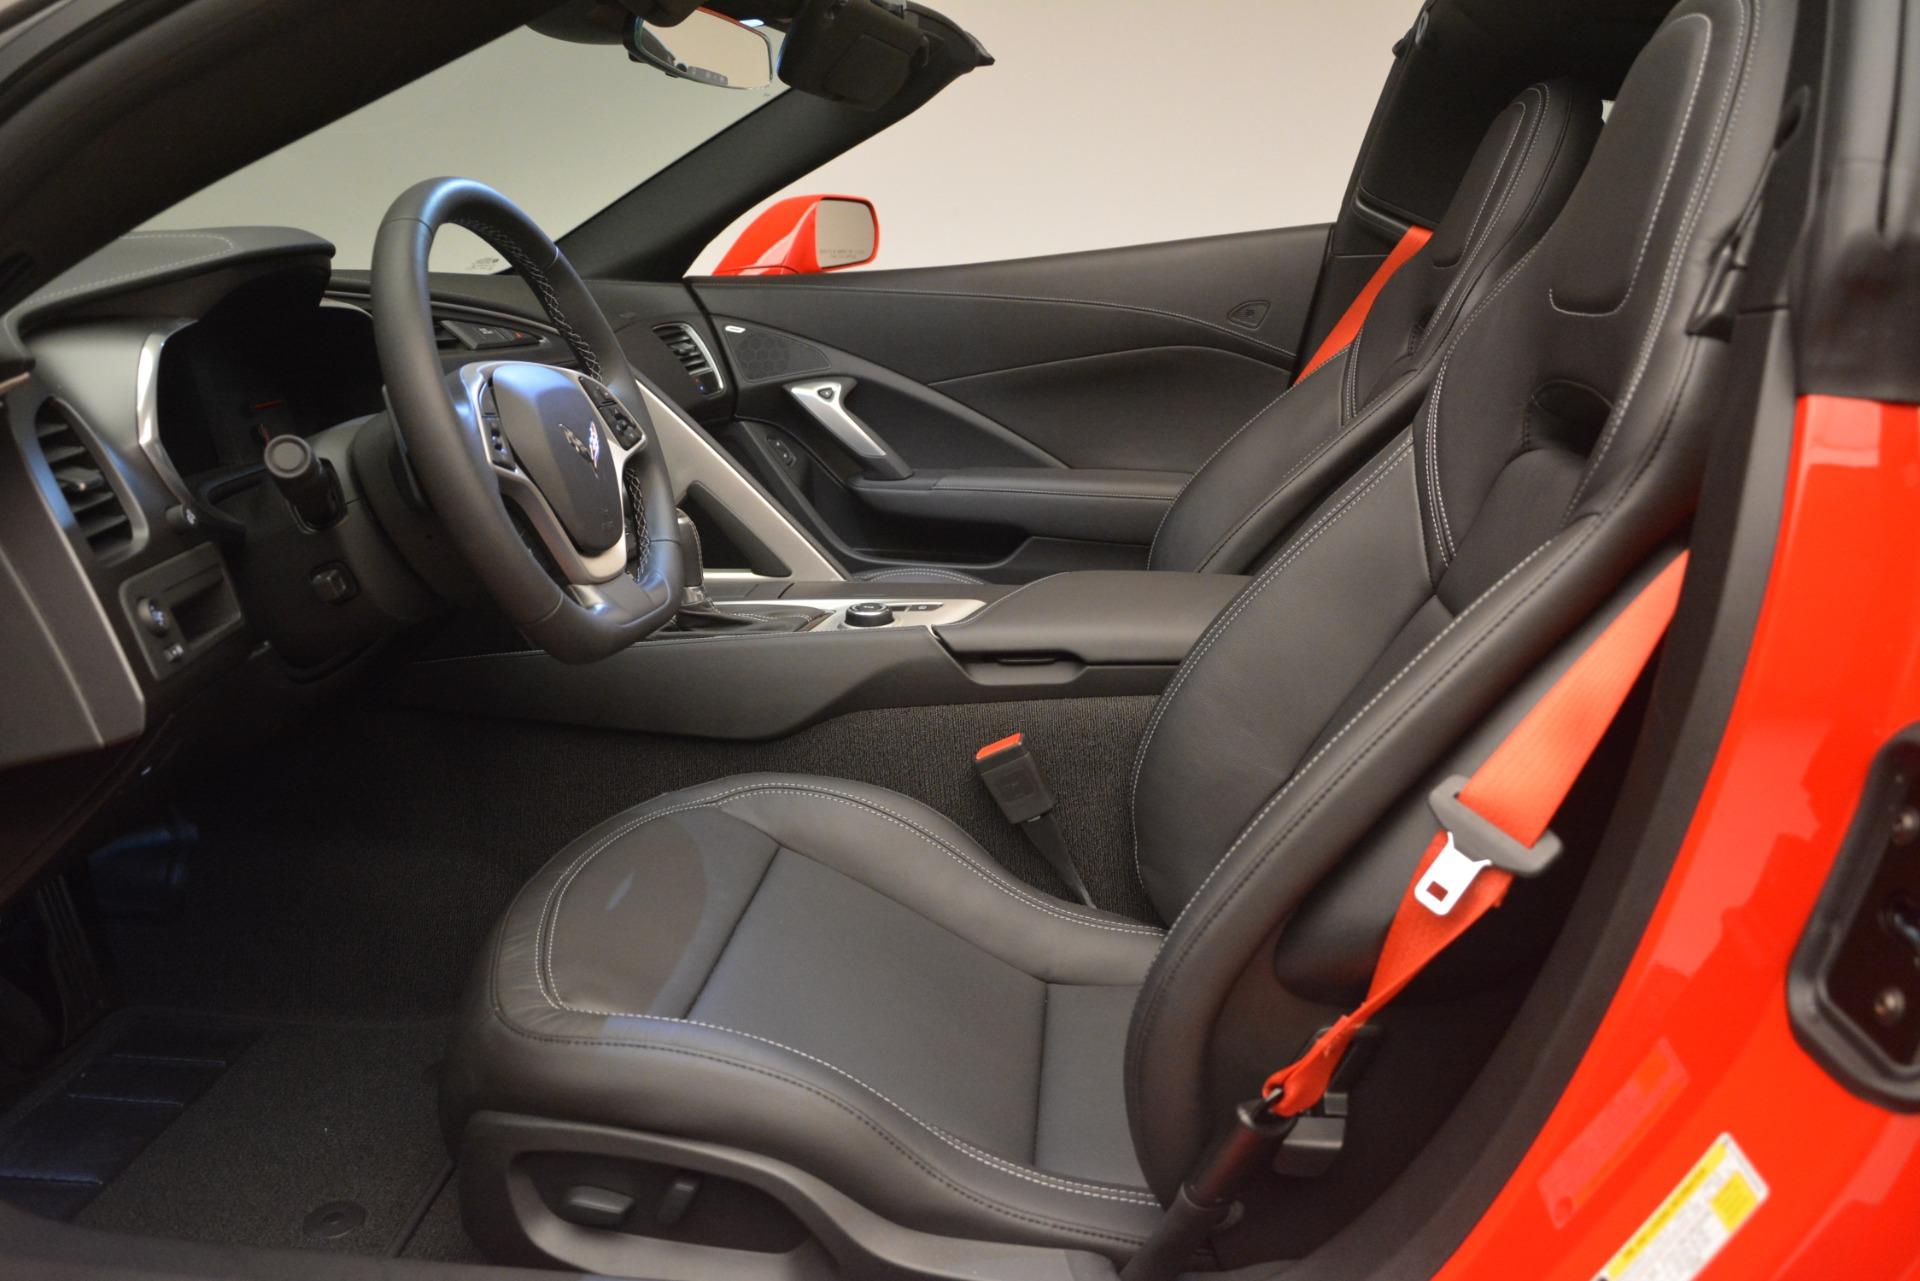 Used 2019 Chevrolet Corvette Grand Sport For Sale In Greenwich, CT 3169_p20